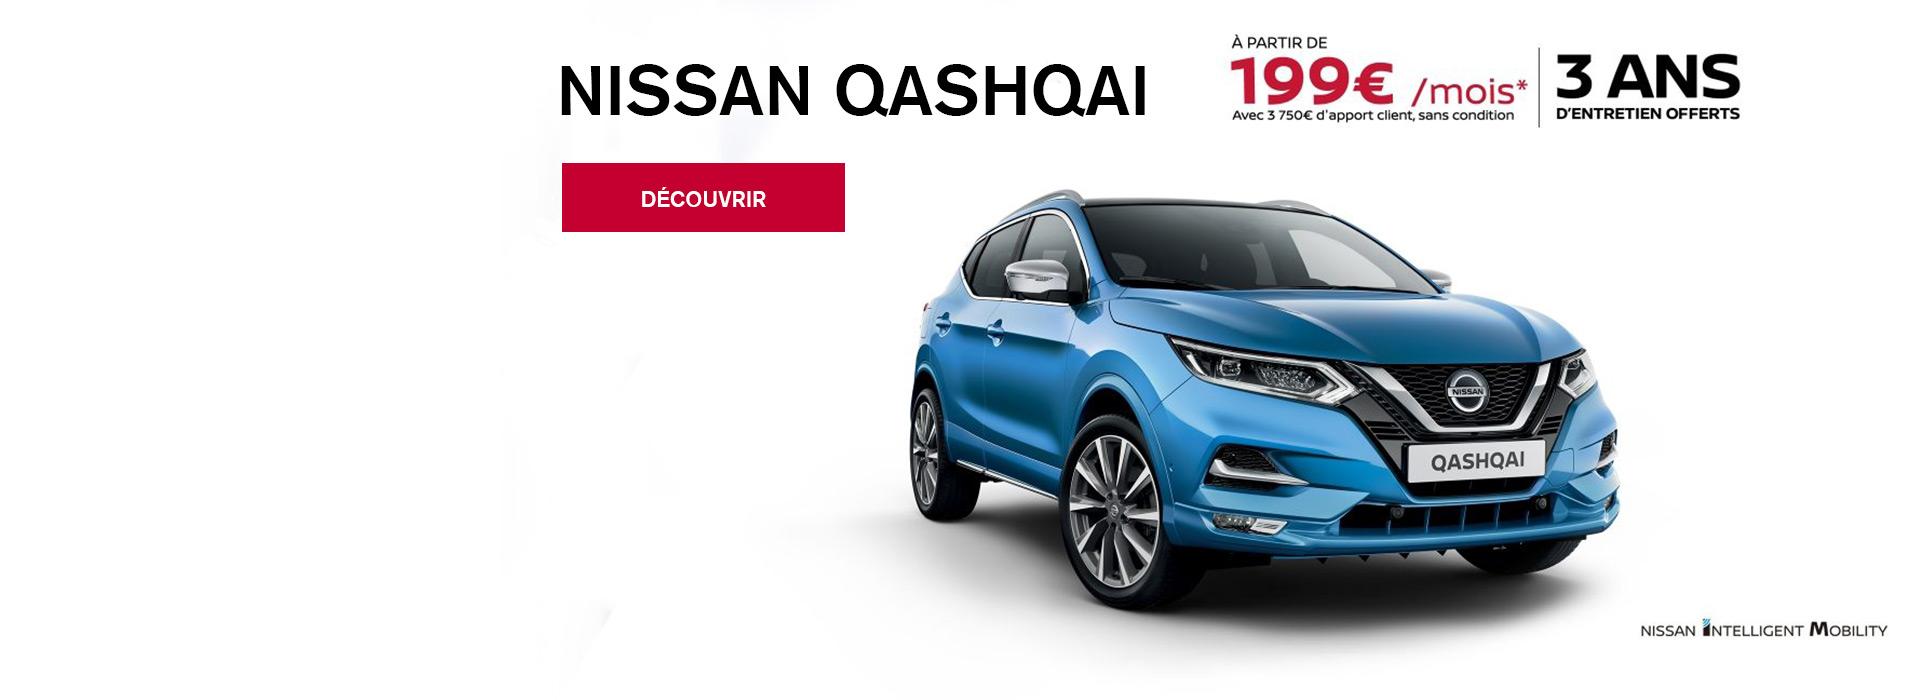 Nissan metz vente voiture neuve vehicule occasion for Garage vente voiture occasion metz